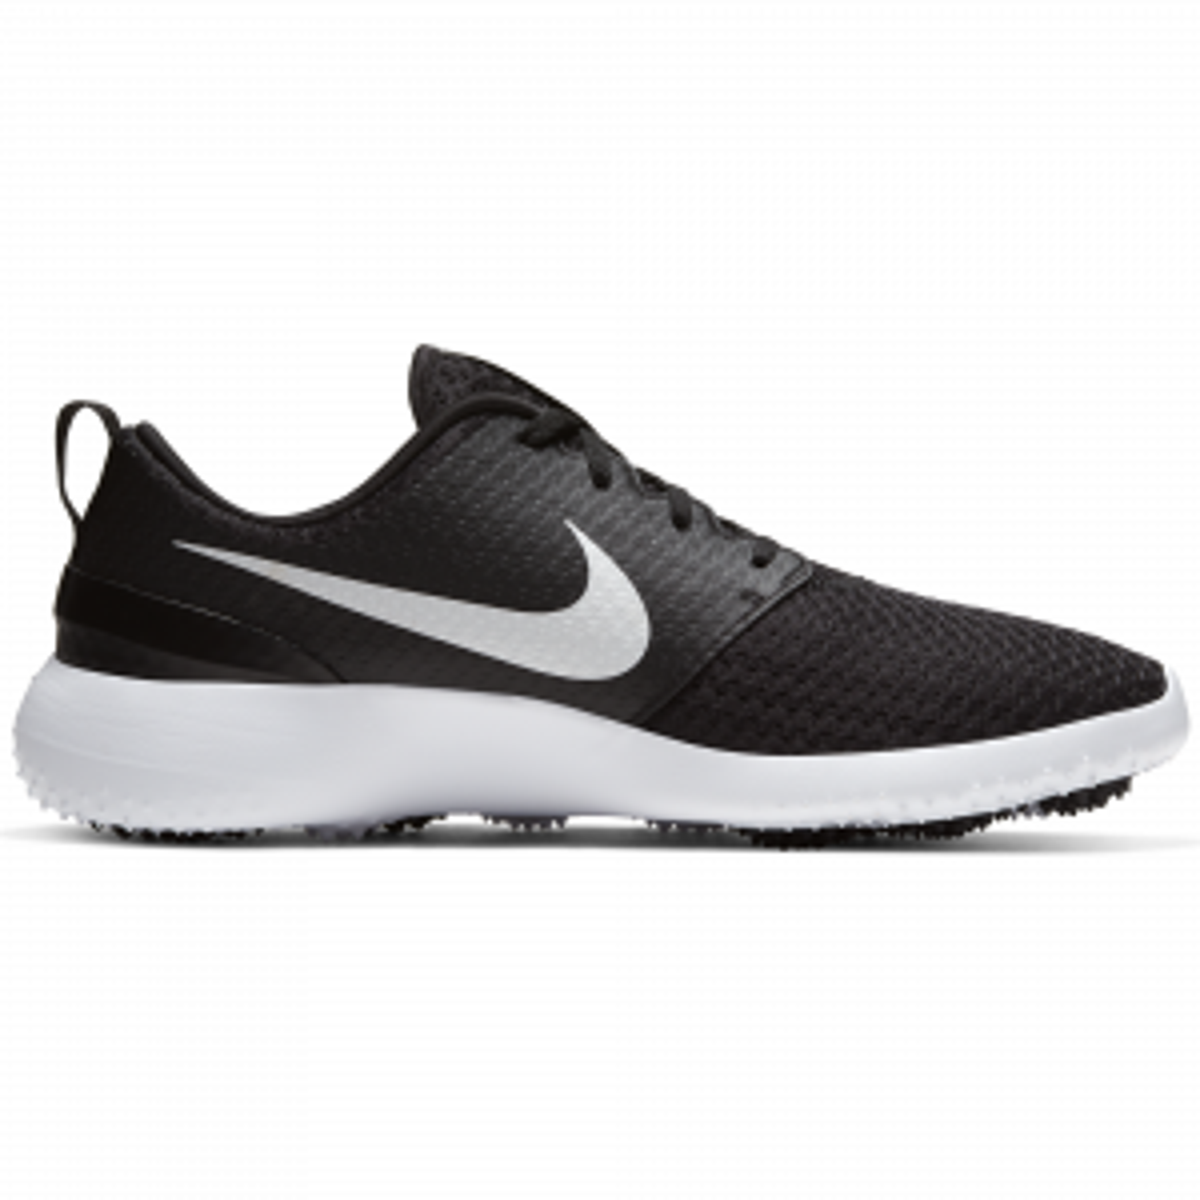 Nike Sko Roshe G Herre Sort/Hvit